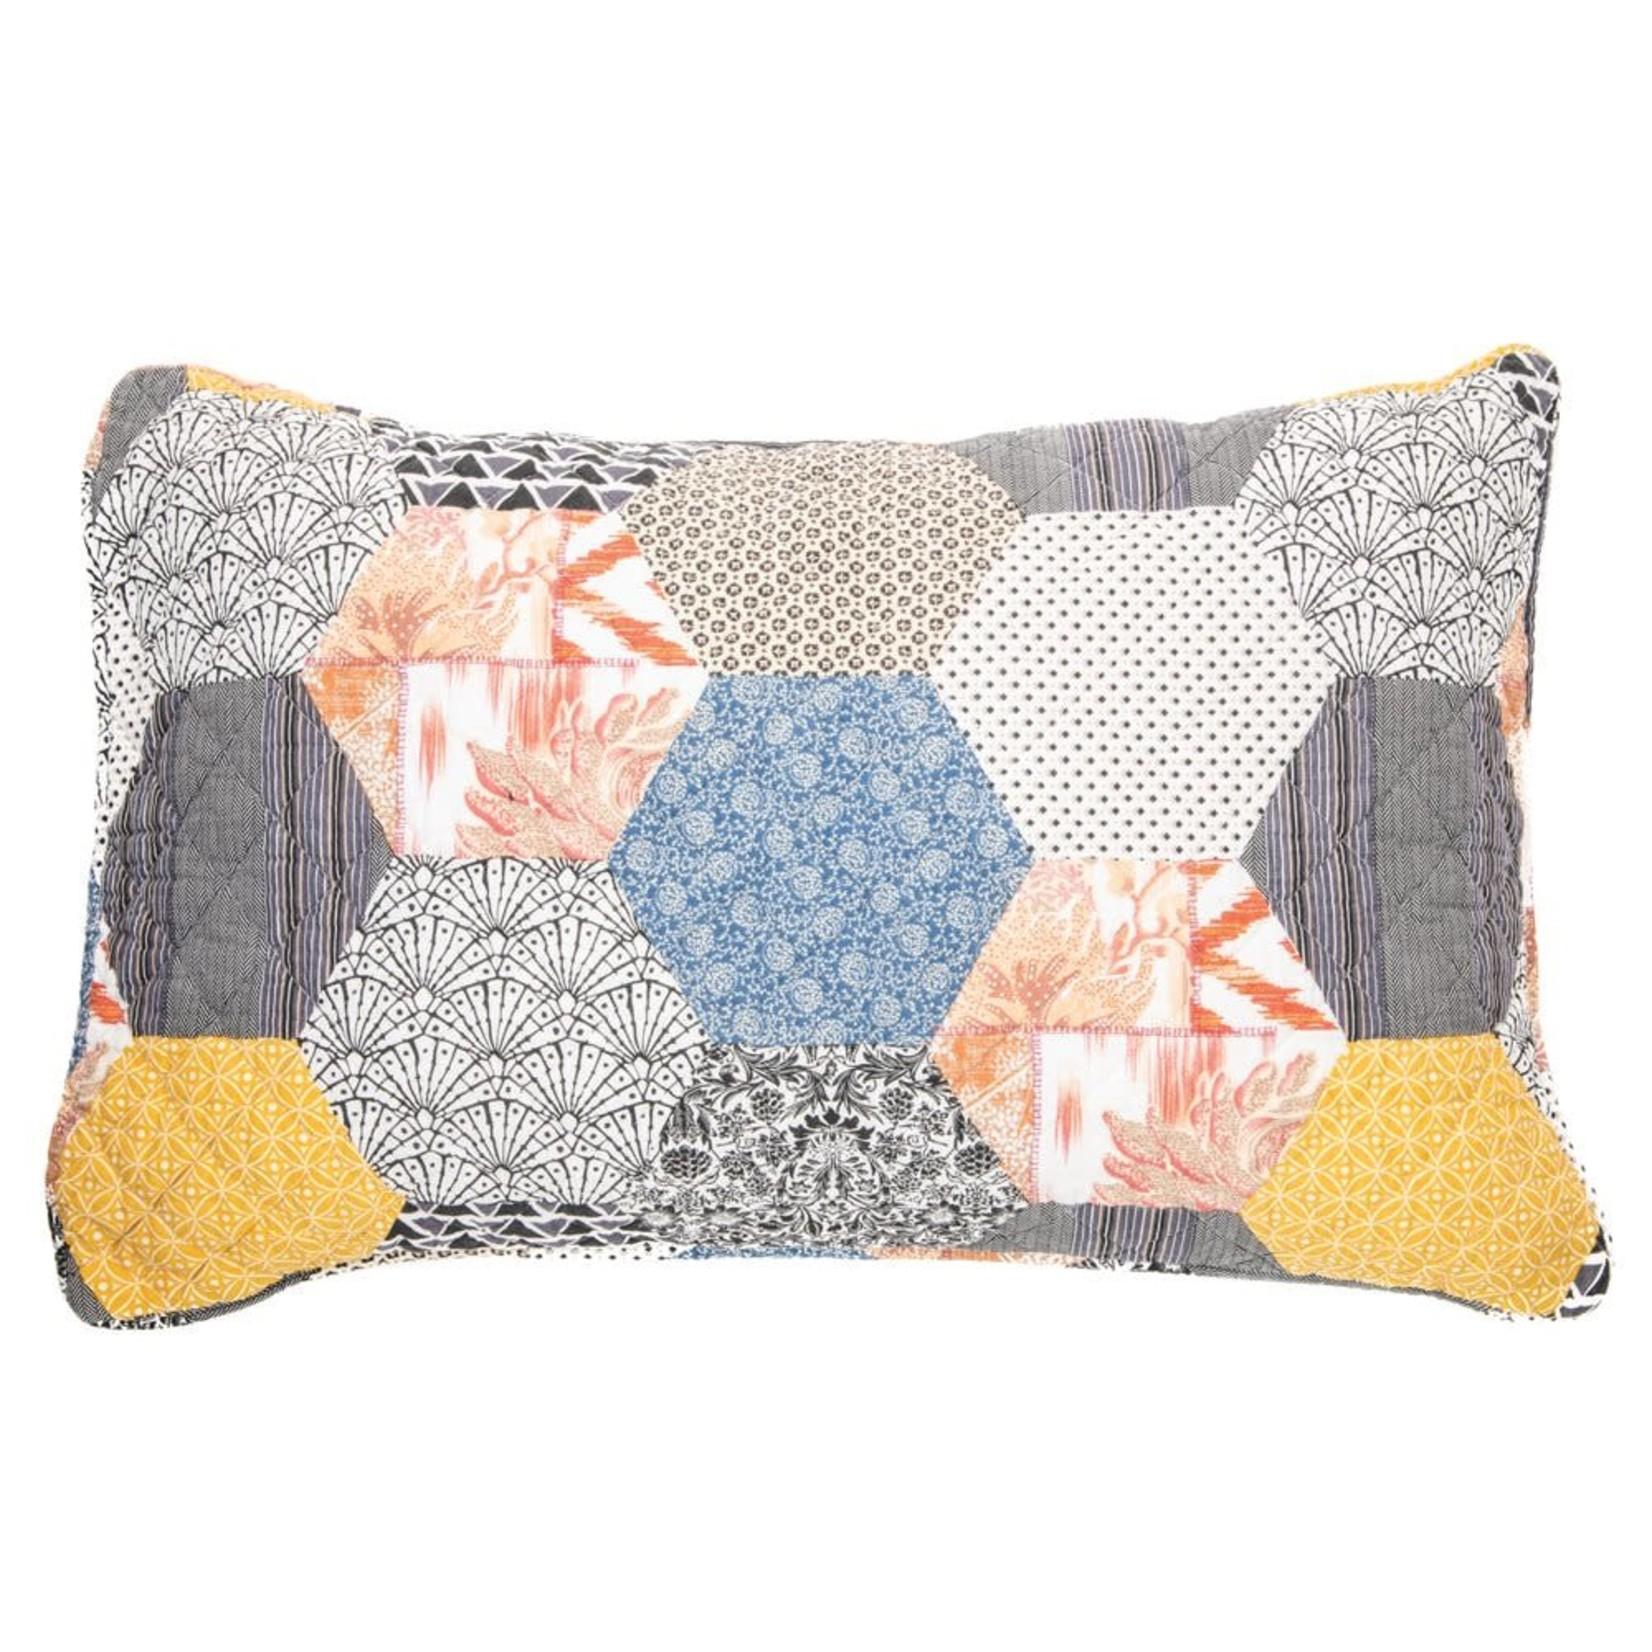 Abee Patchwork Pillow Sham - Set of 2